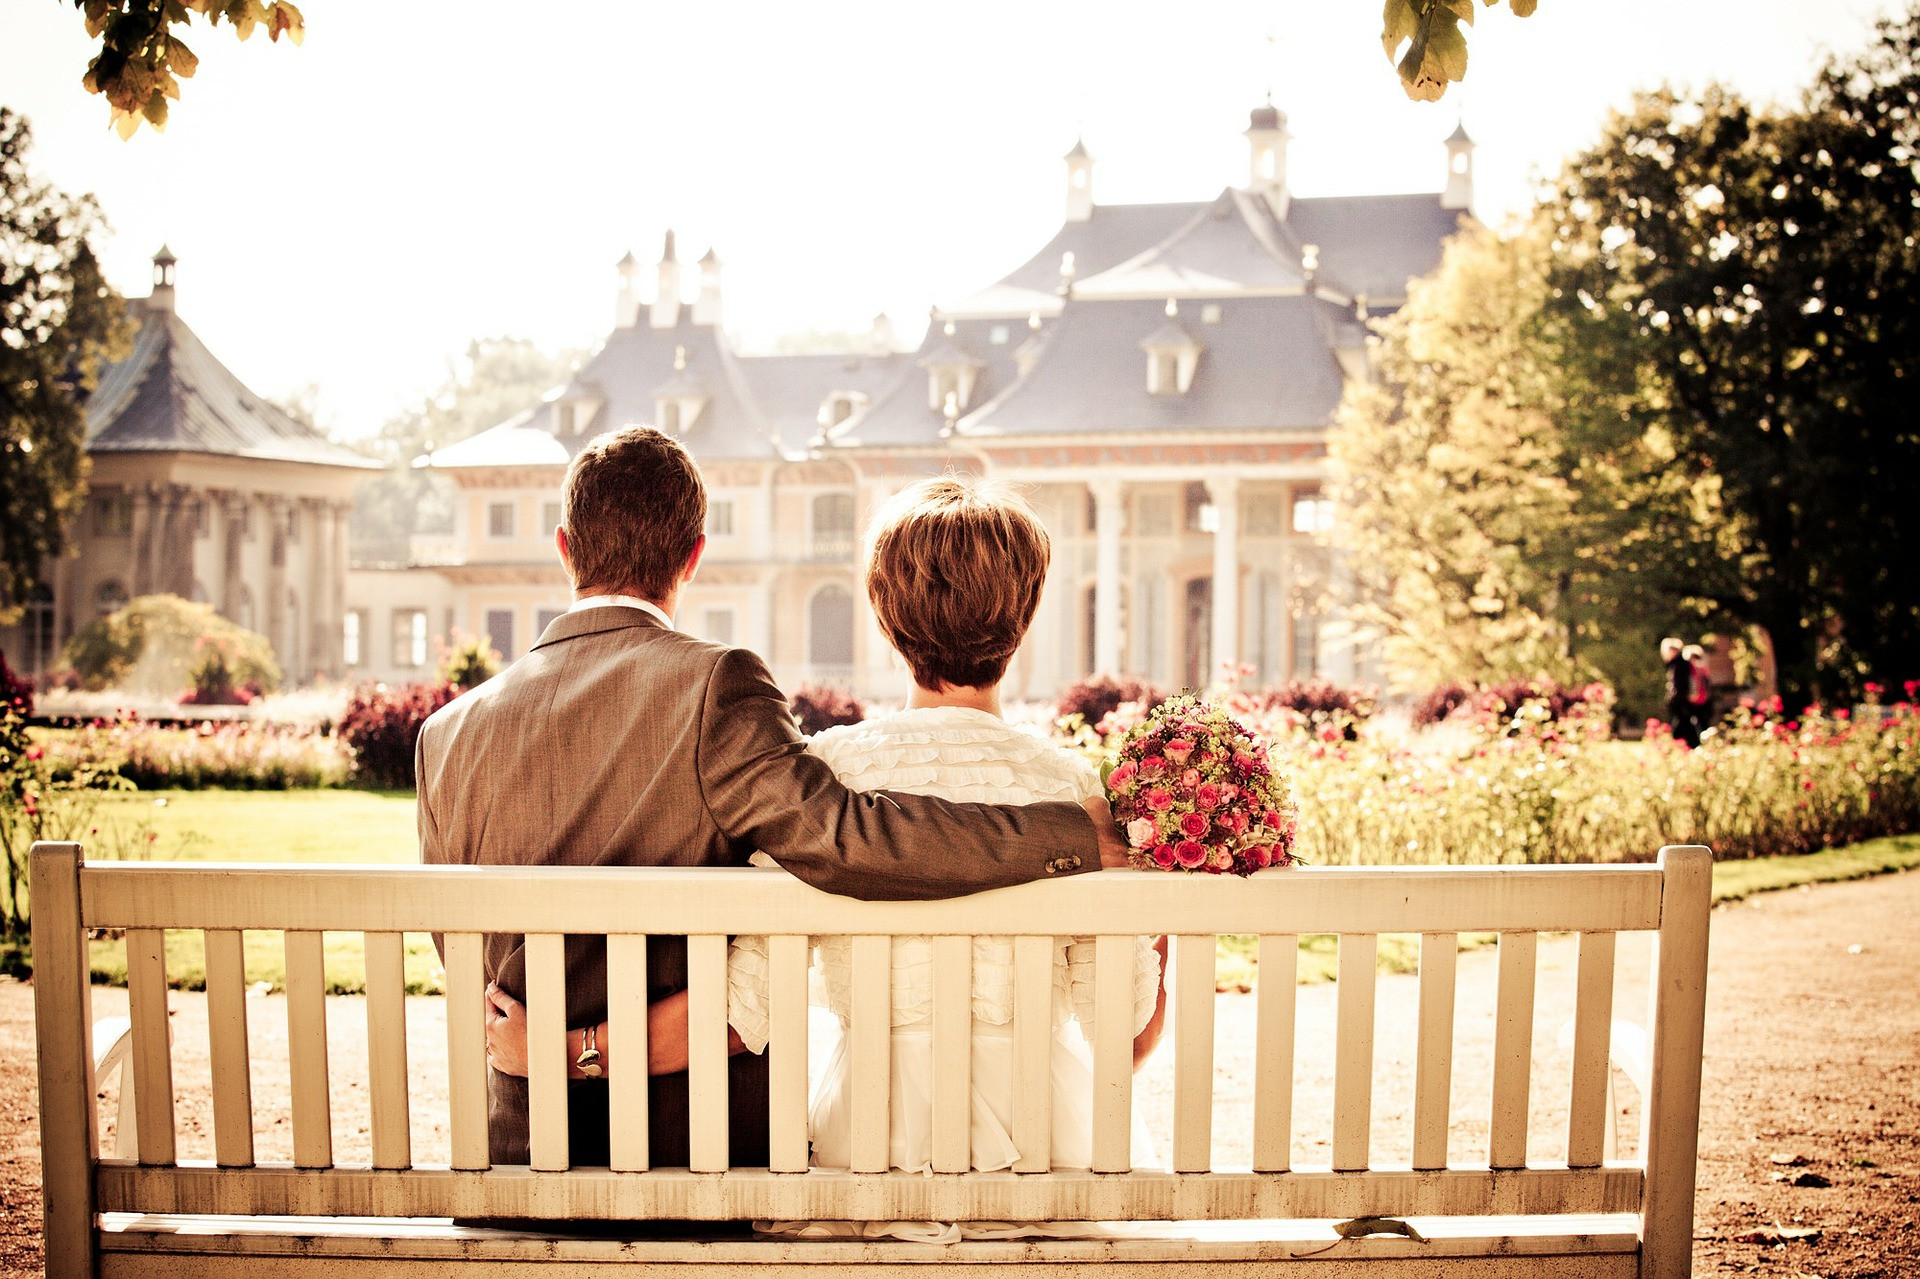 Pernikahan Diambang Kehancuran, Selamatkan dengan 3 Cara Ini - JPNN.com